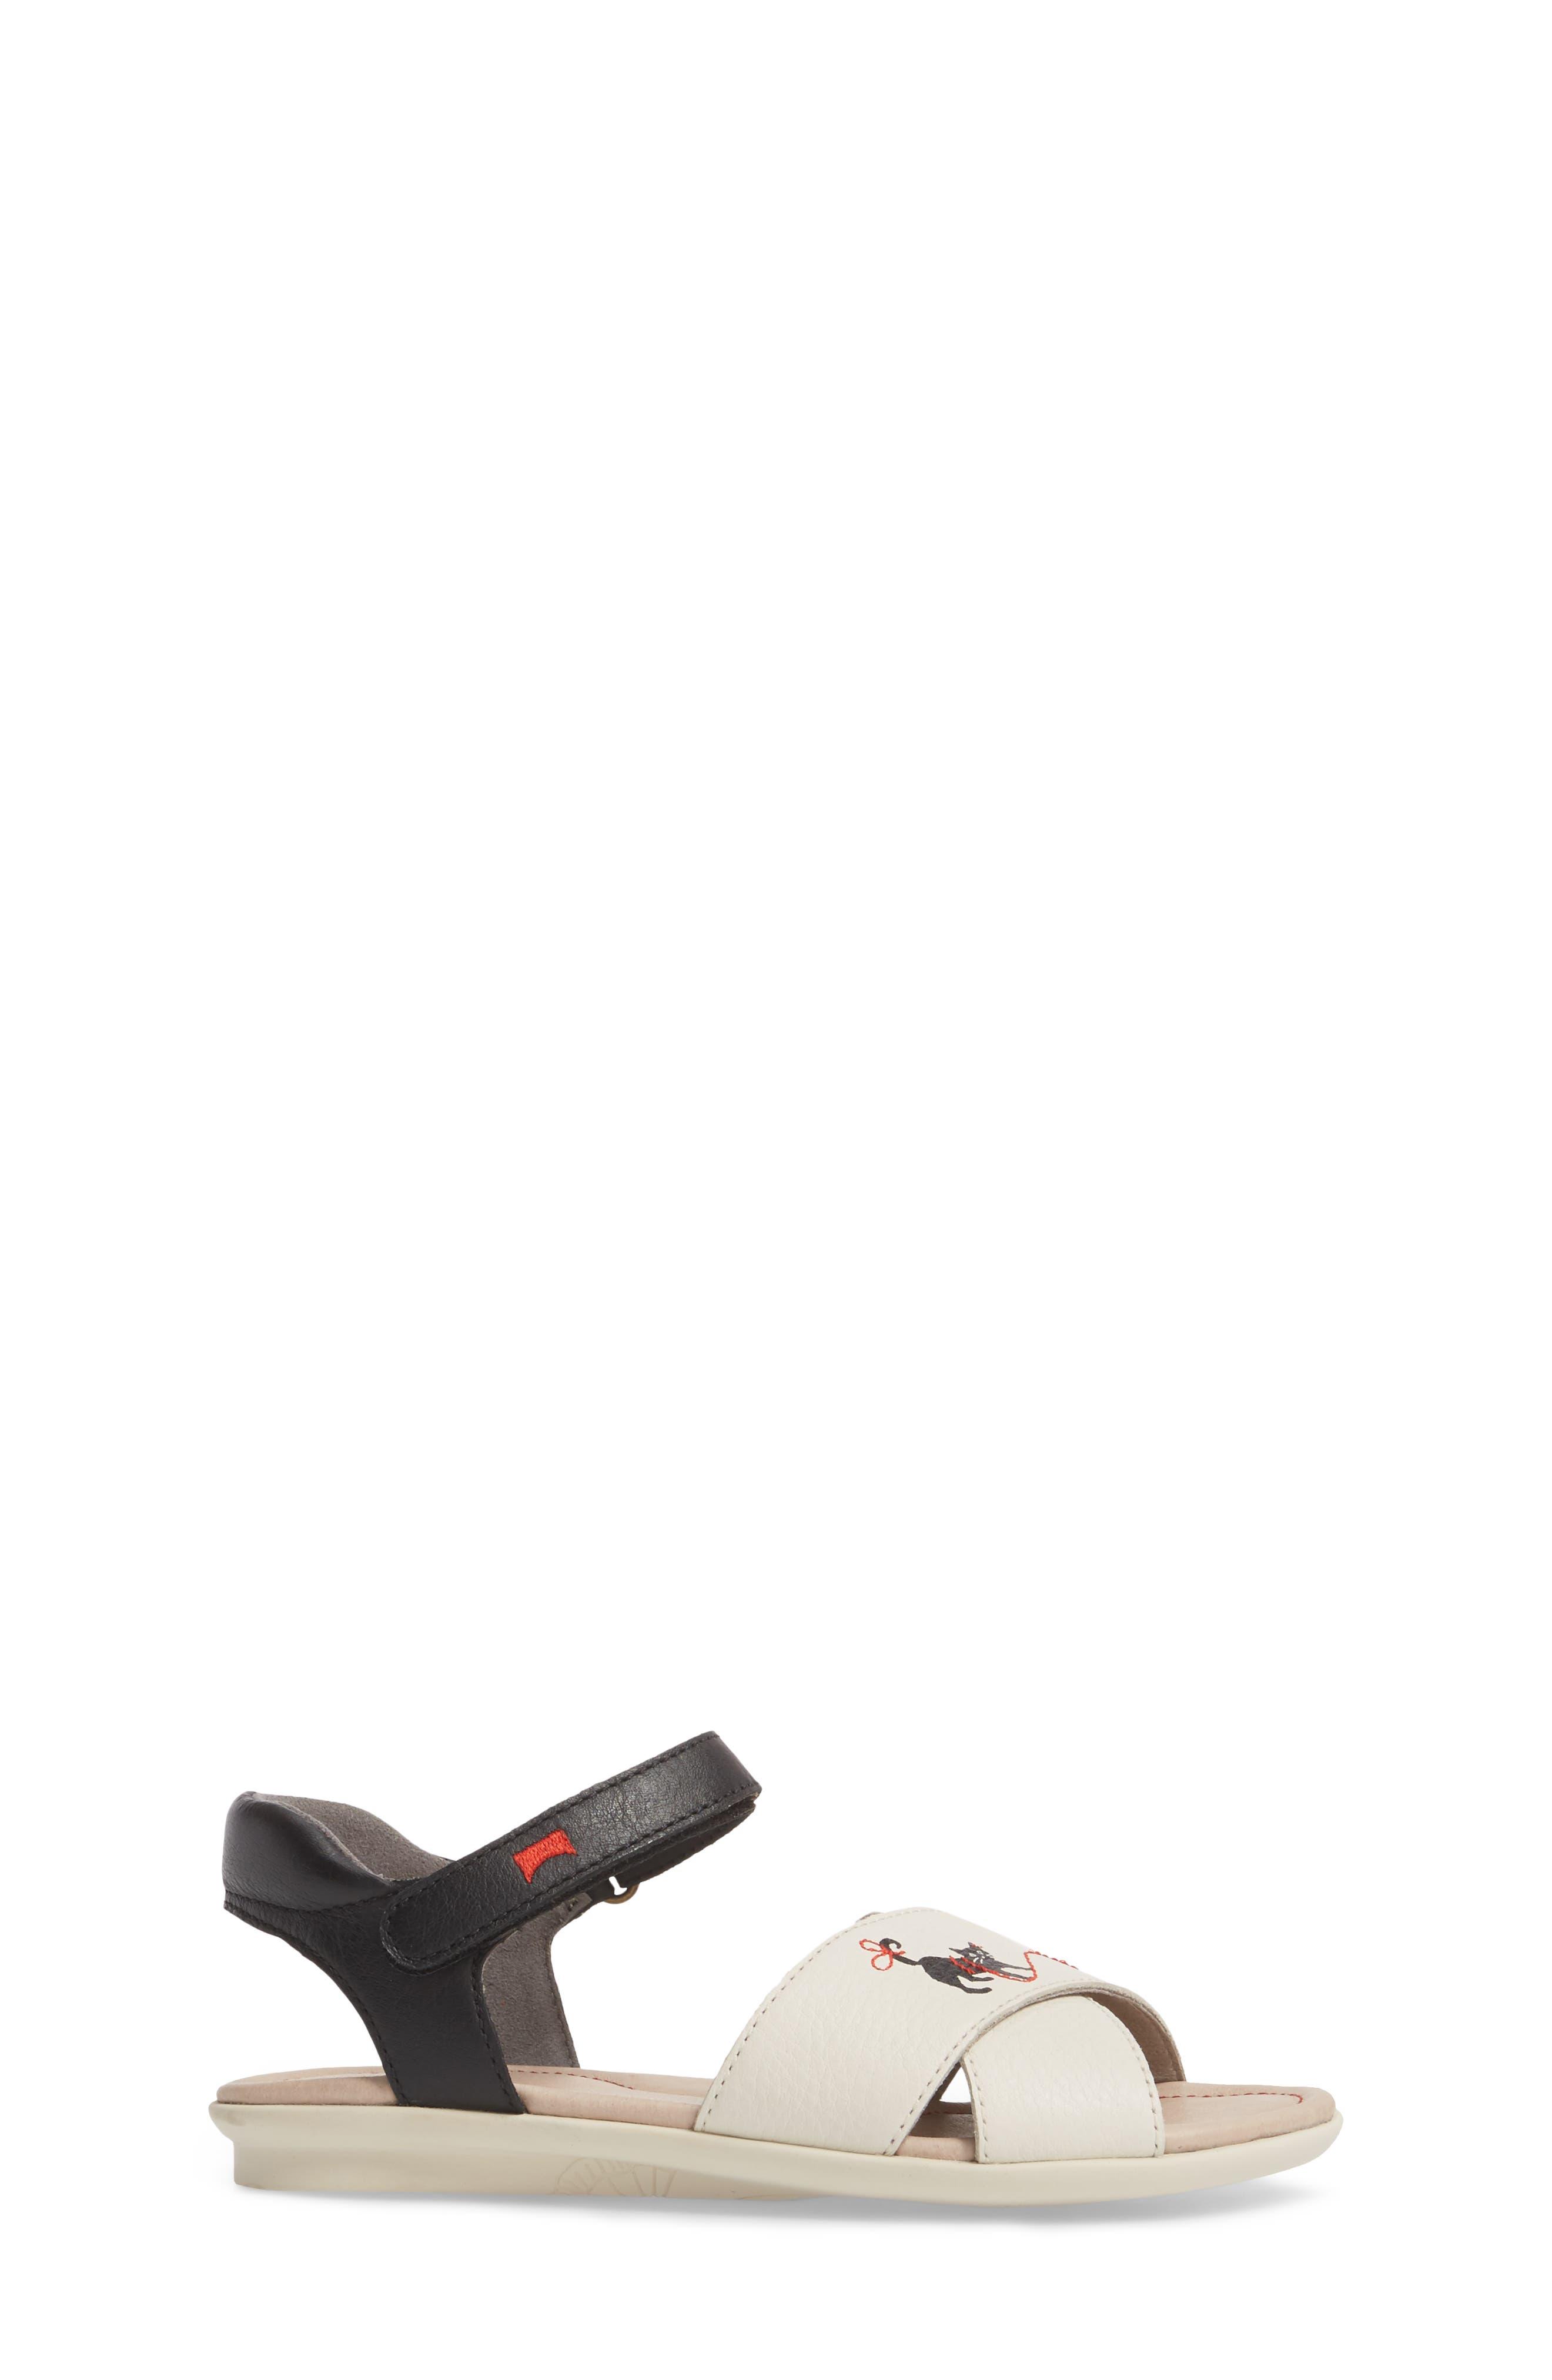 Twins Sandal,                             Alternate thumbnail 3, color,                             100